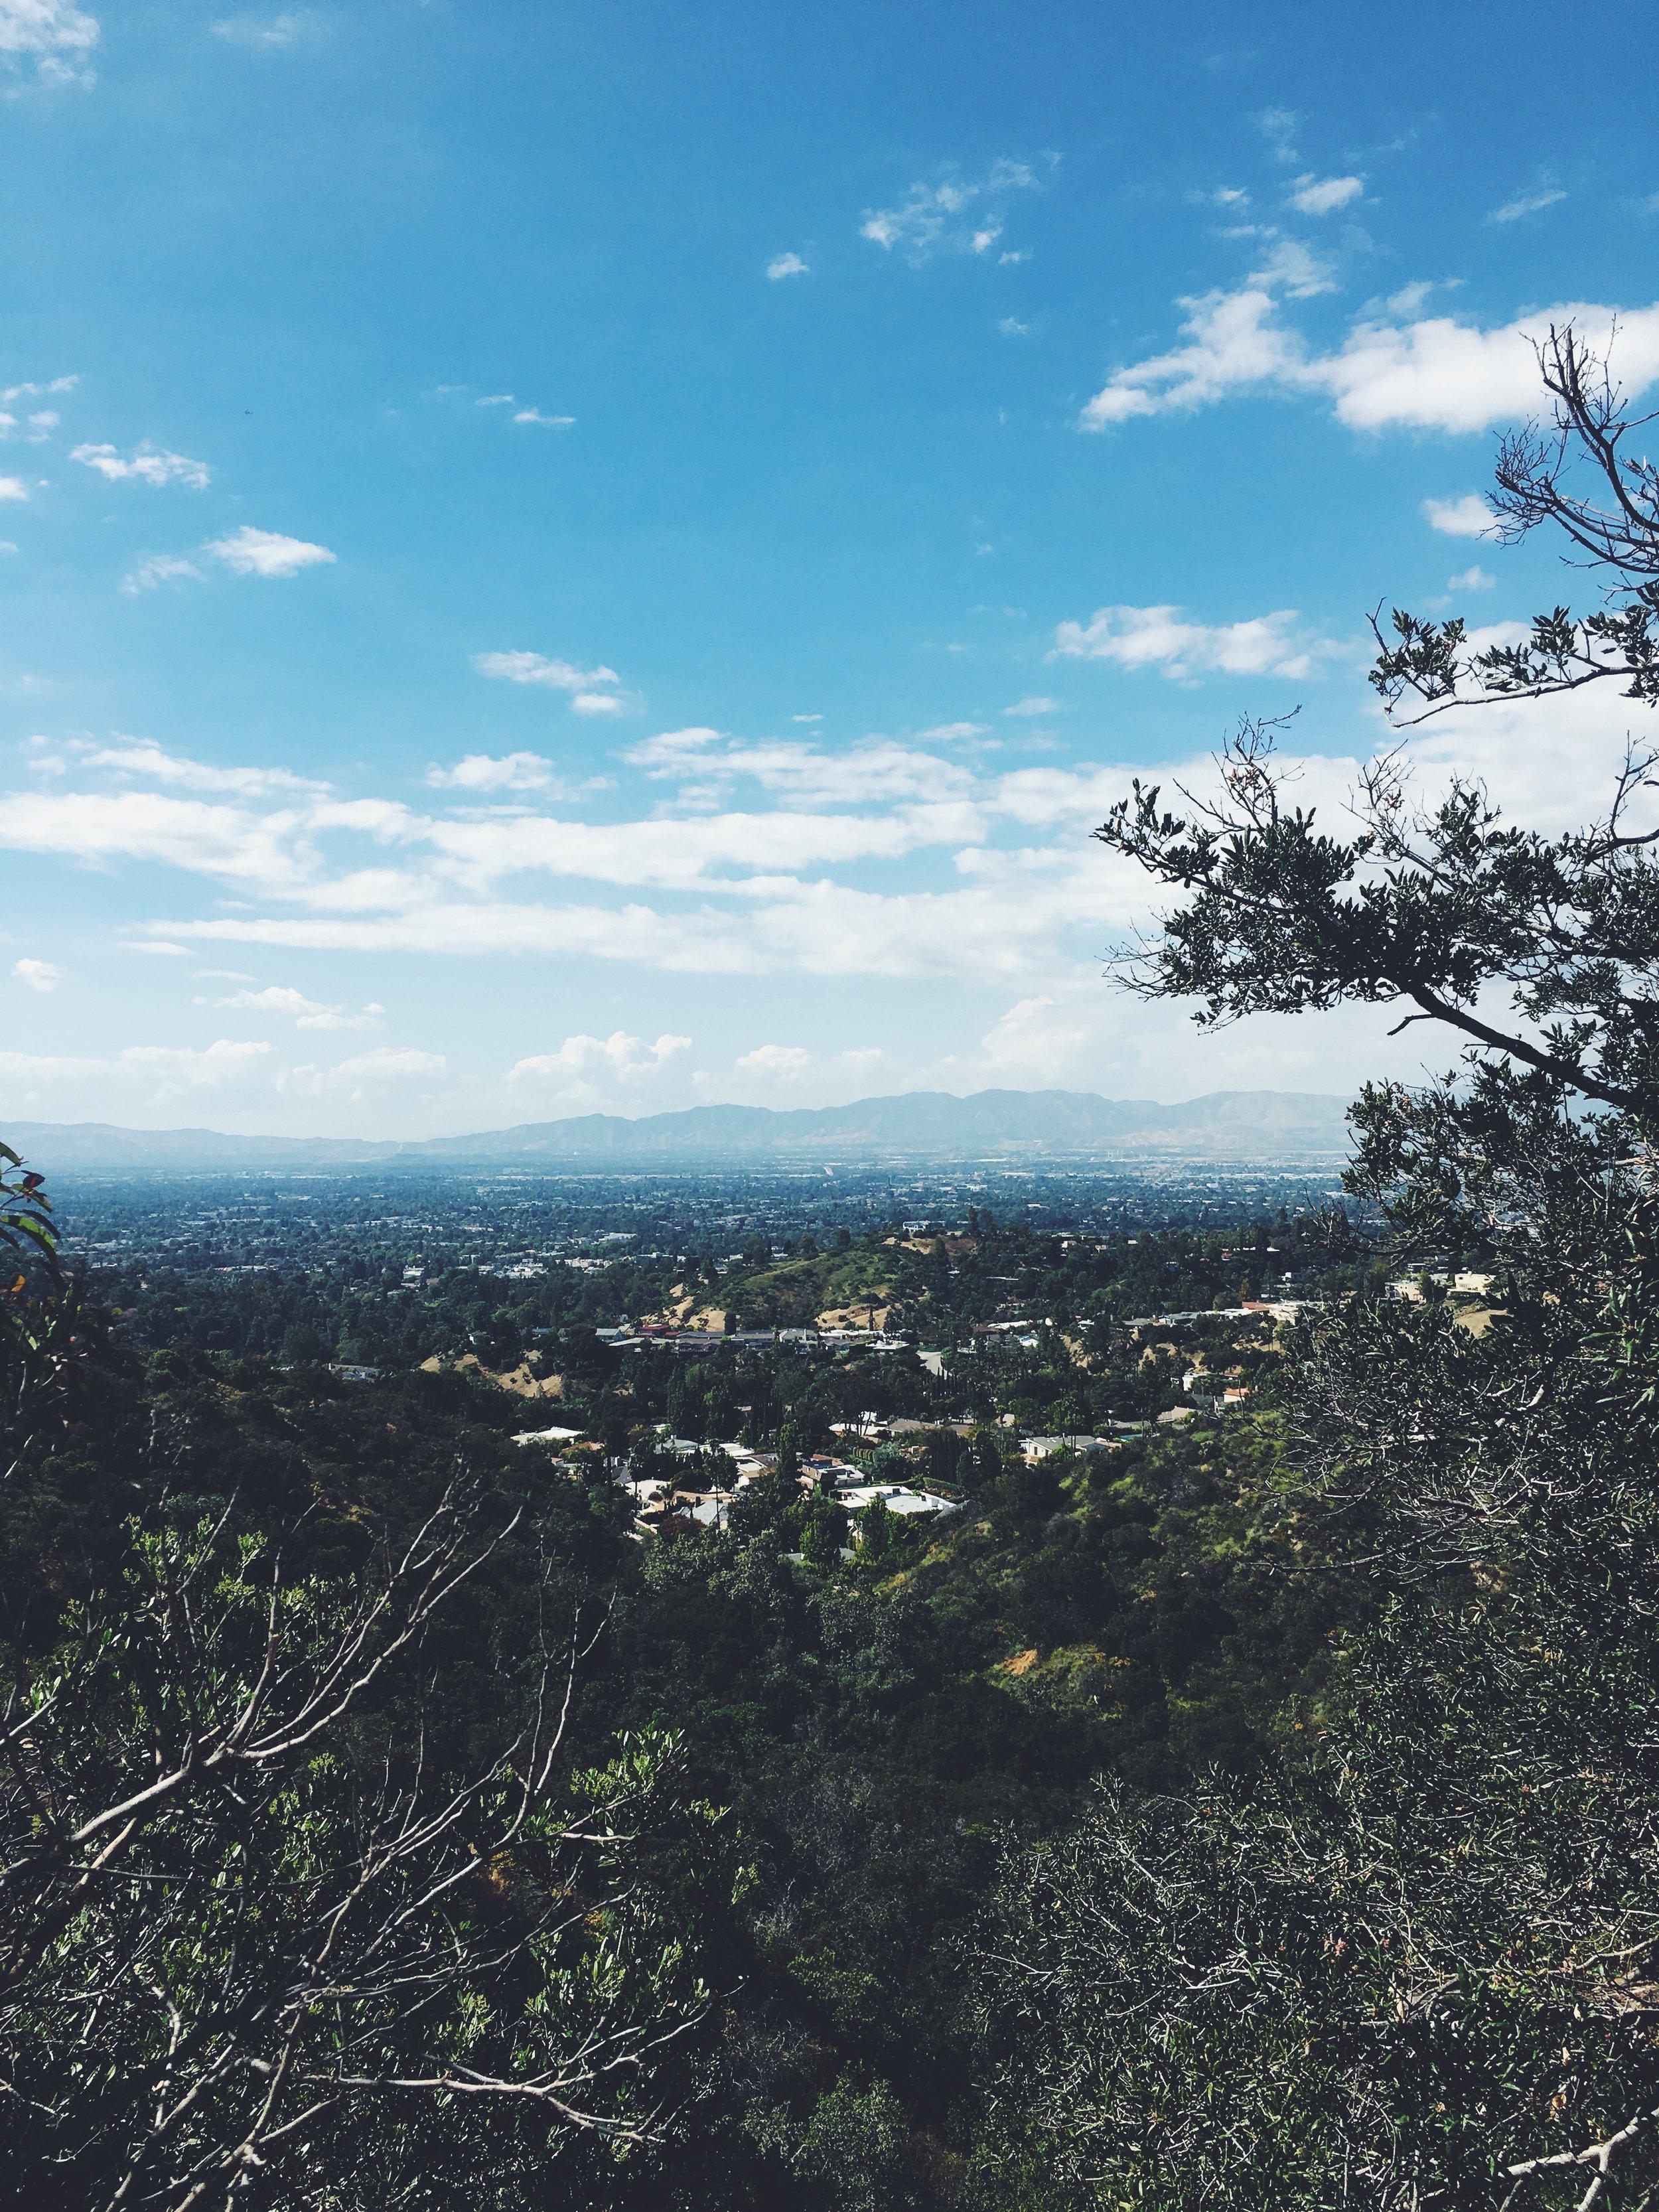 Mulholland Drive Secret Hike Mountain Views.JPG